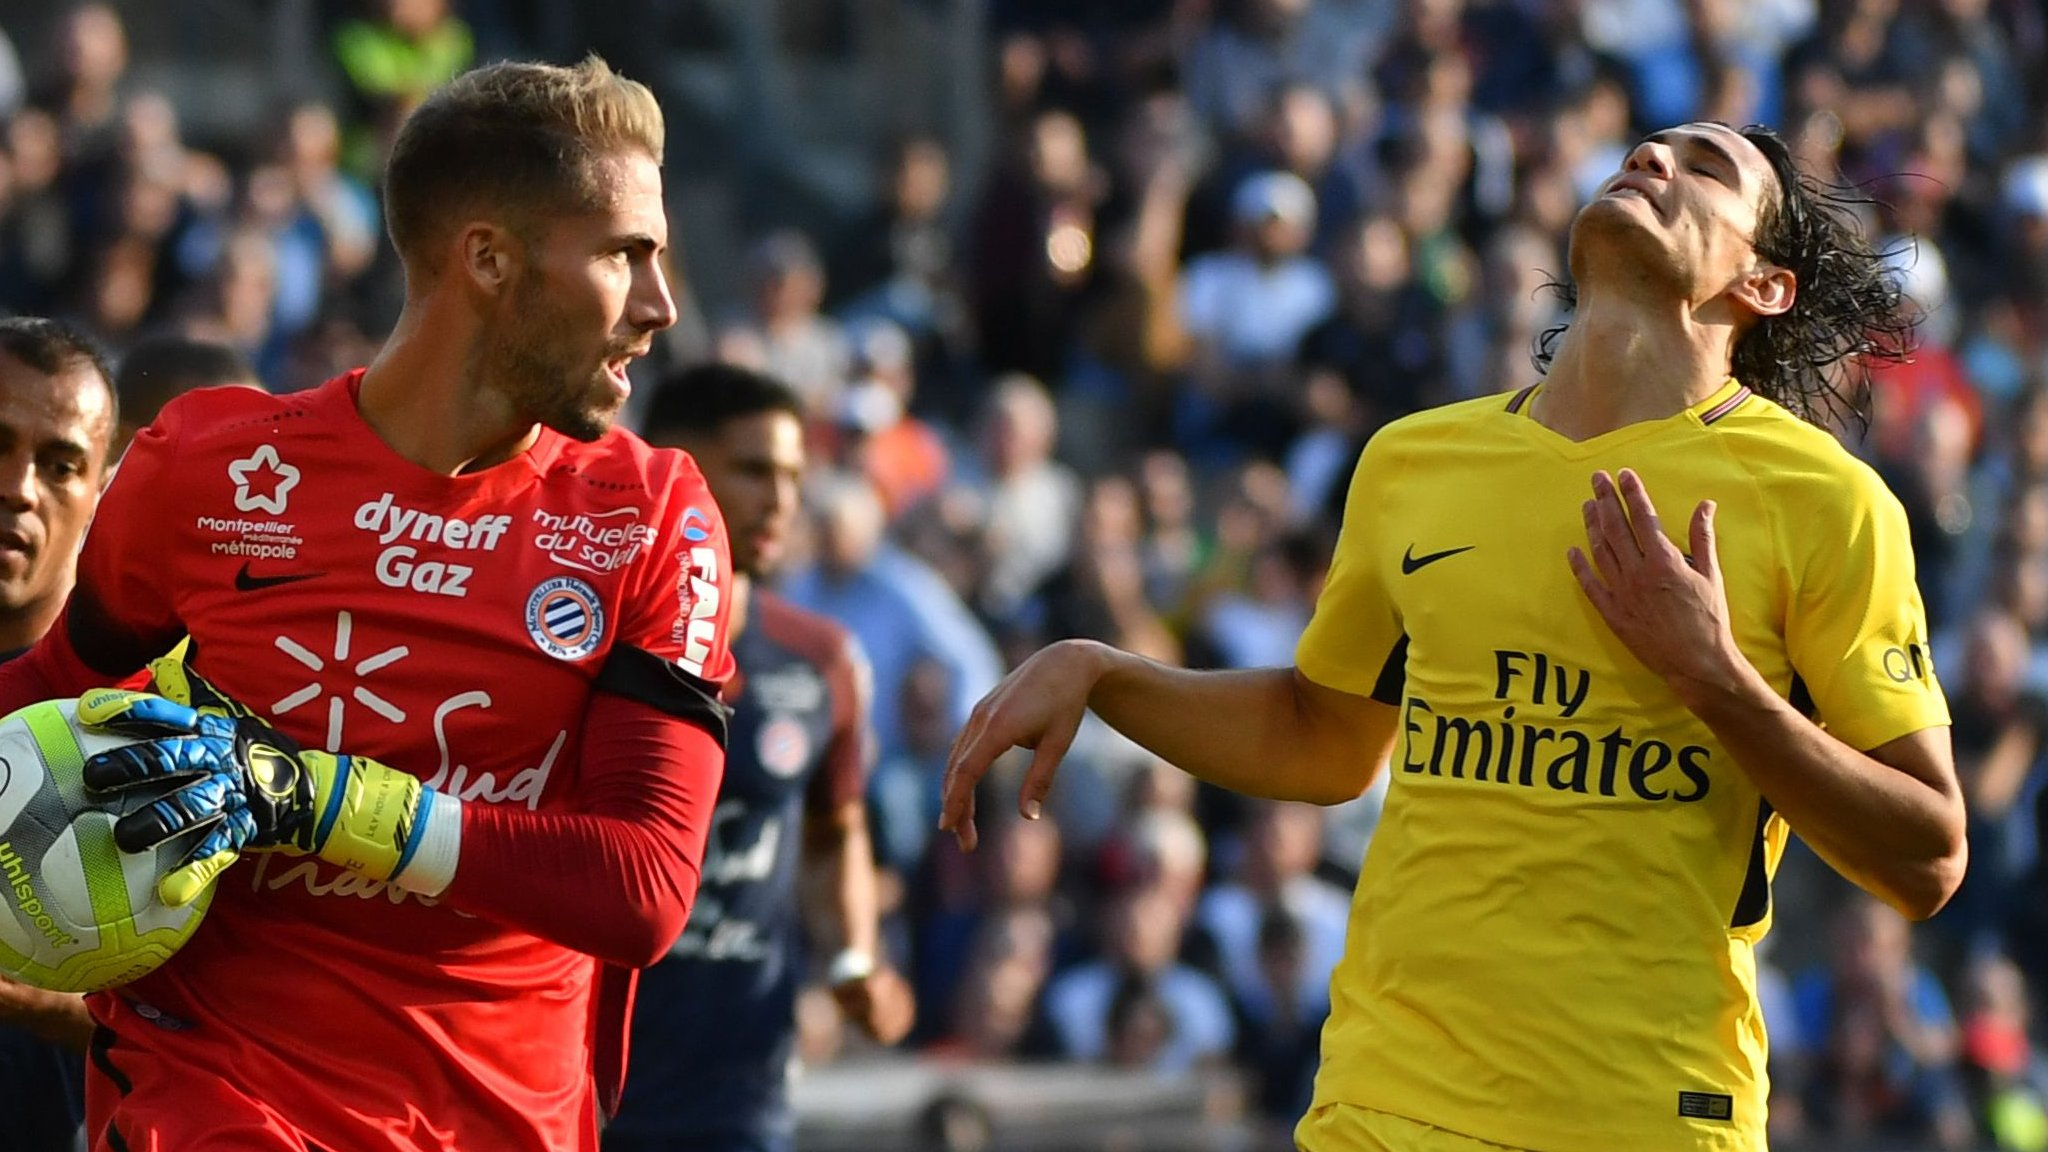 PSG miss Neymar in draw with Montpellier